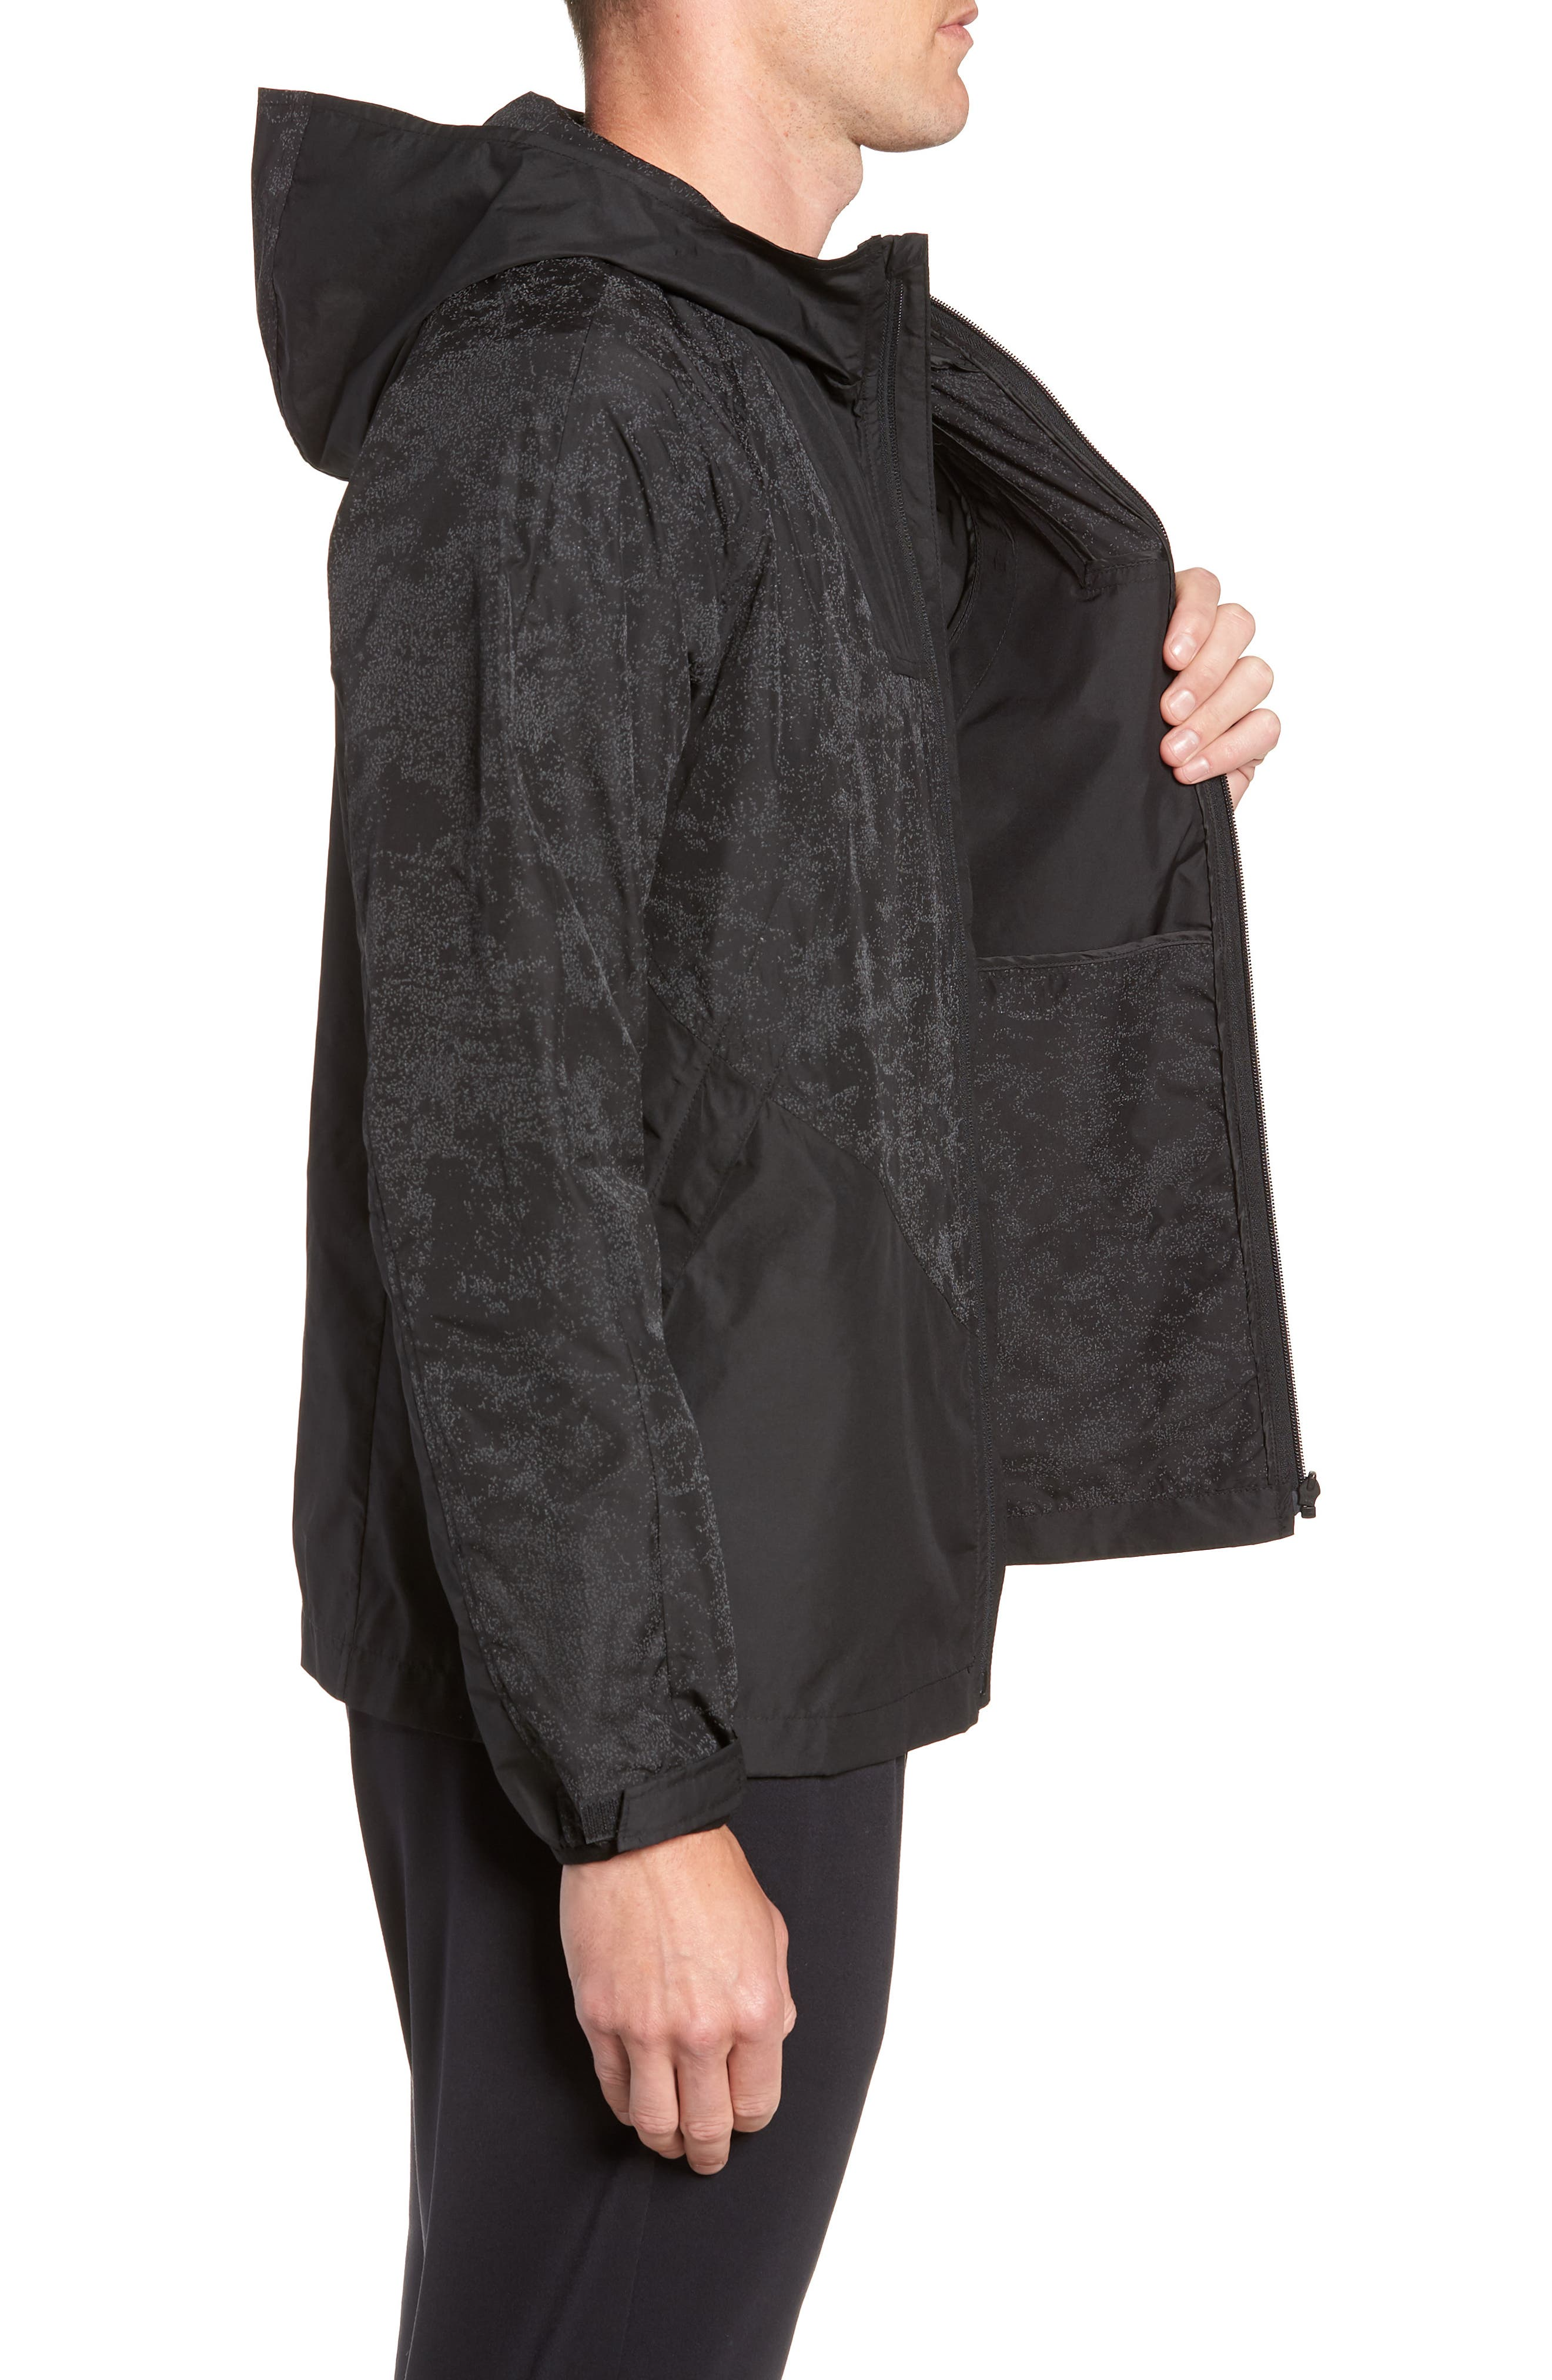 Hooded Reflective Jacket,                             Alternate thumbnail 3, color,                             BLACK REFLECTIVE